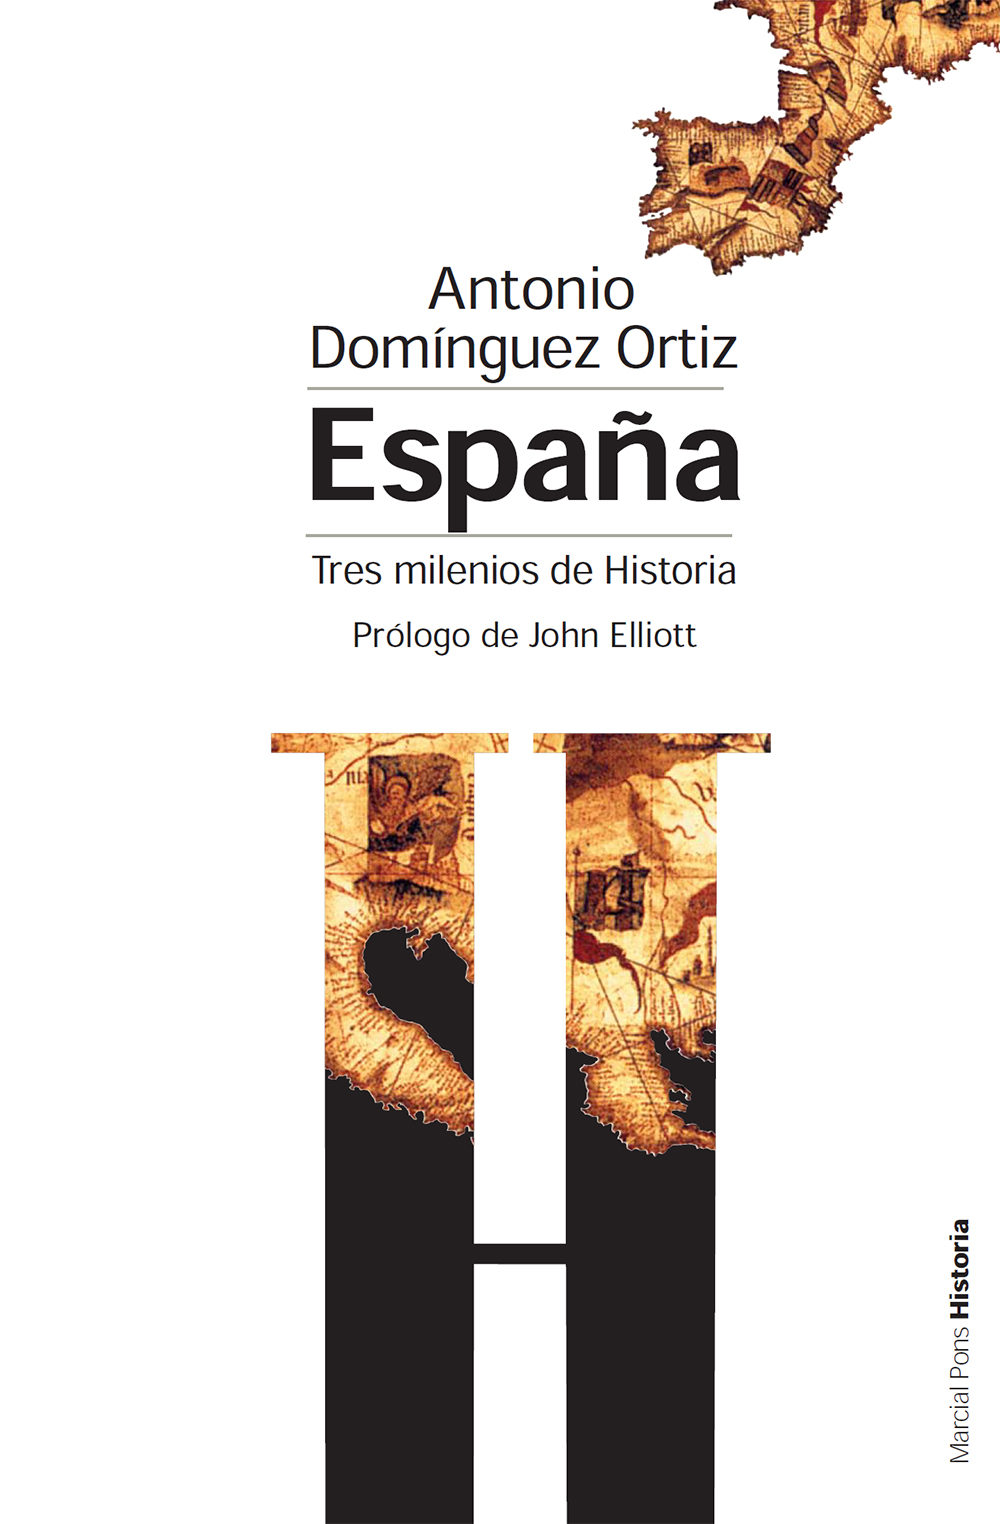 Espana-Tresmileniosdehistoria.jpg